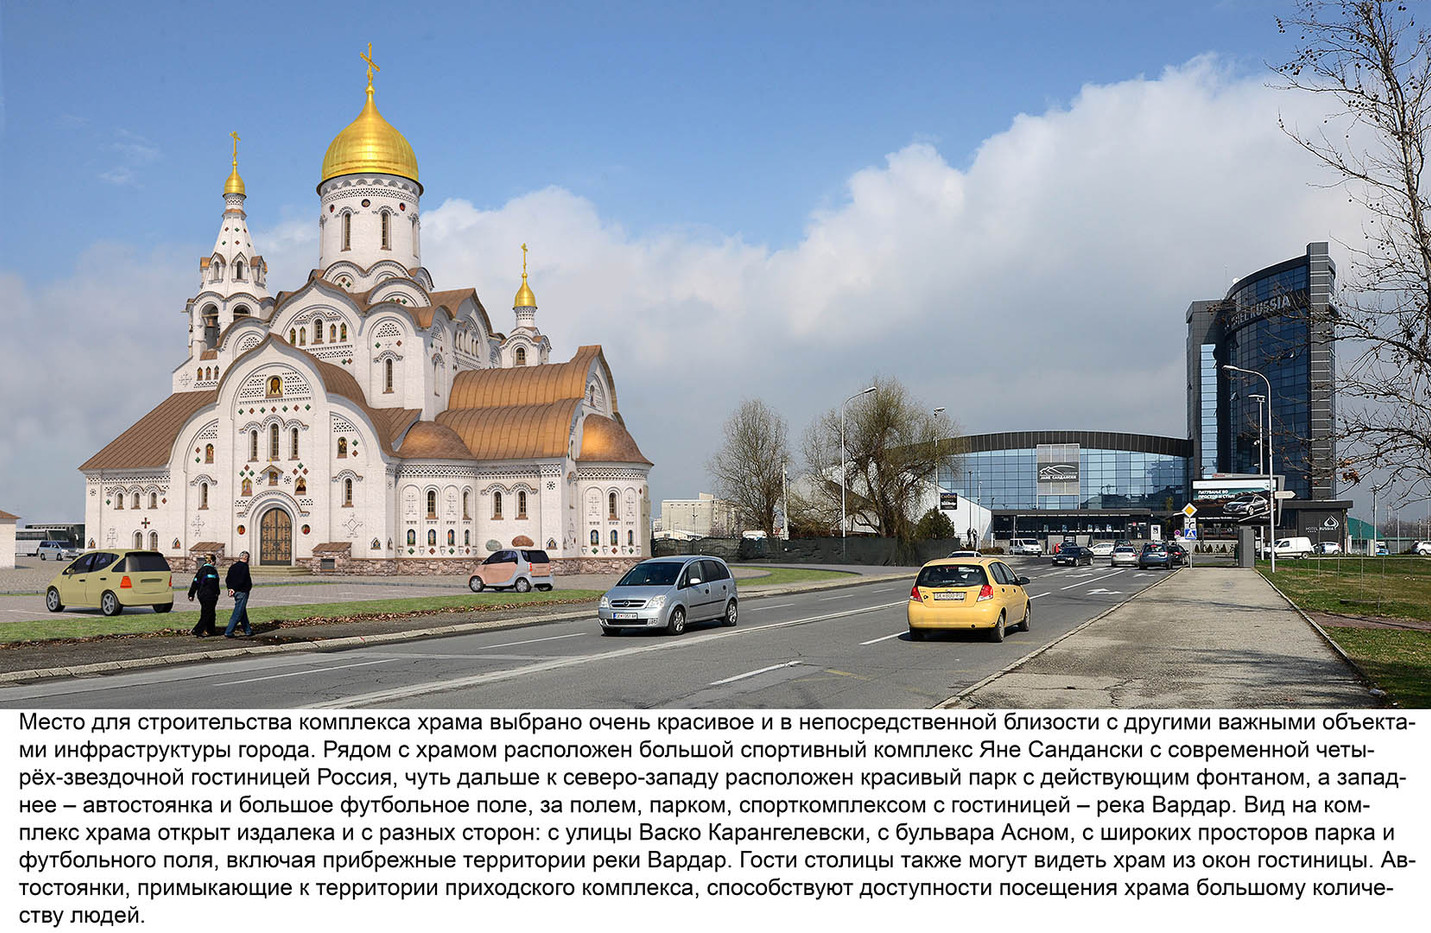 Skopje-hram-5.jpg